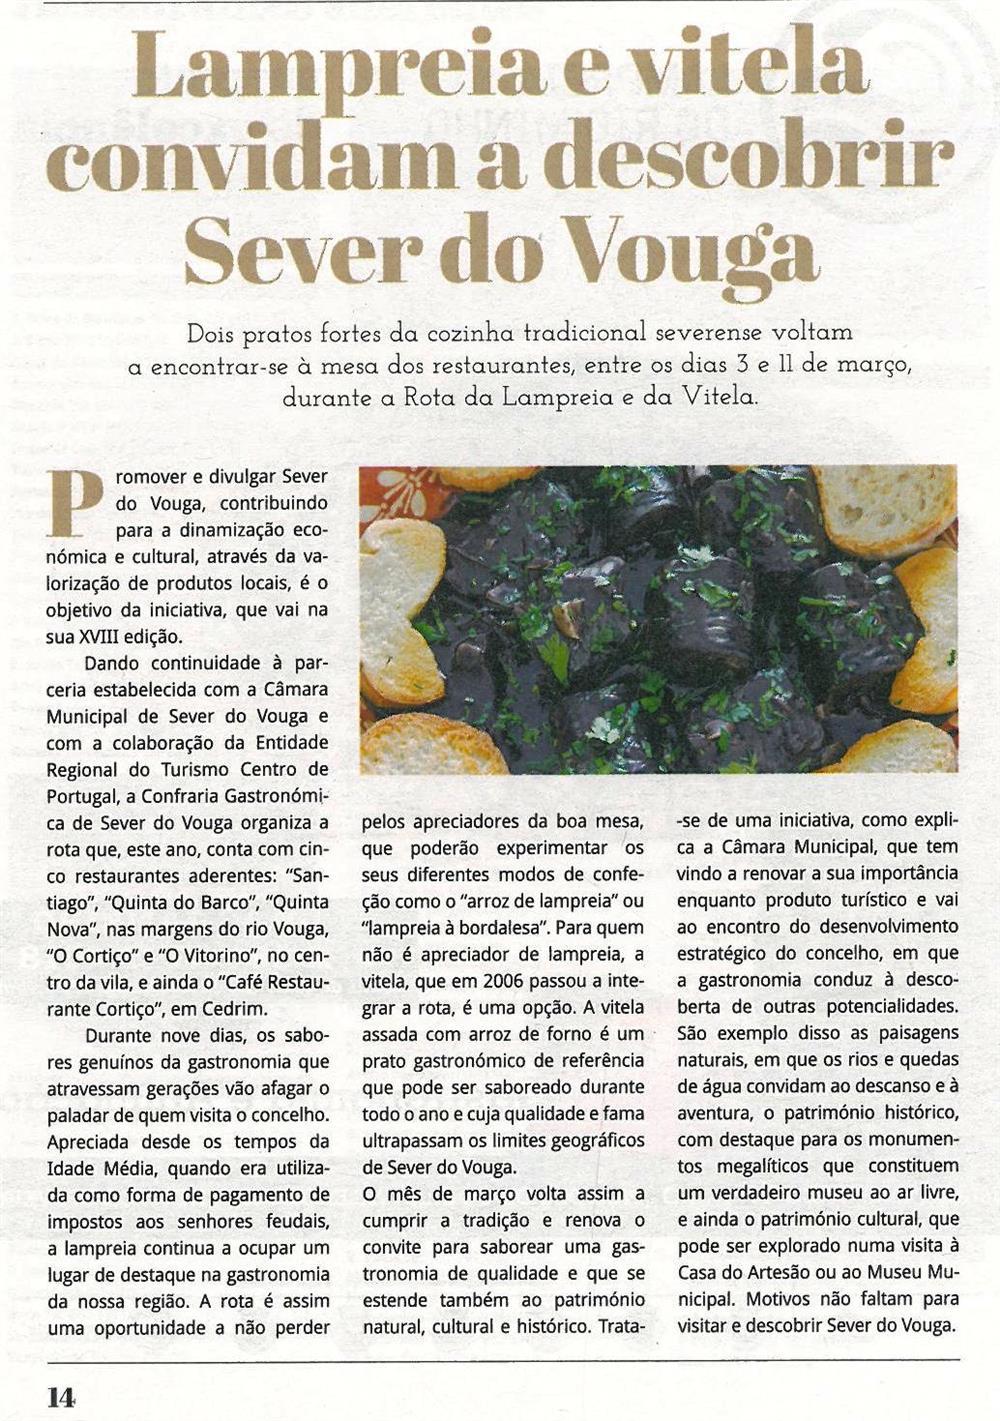 JN-23fev.'18-Festival Gastronómico da Lampreia,p.14-Lampreia e vitela convidam a descobrir Sever do Vouga.jpg